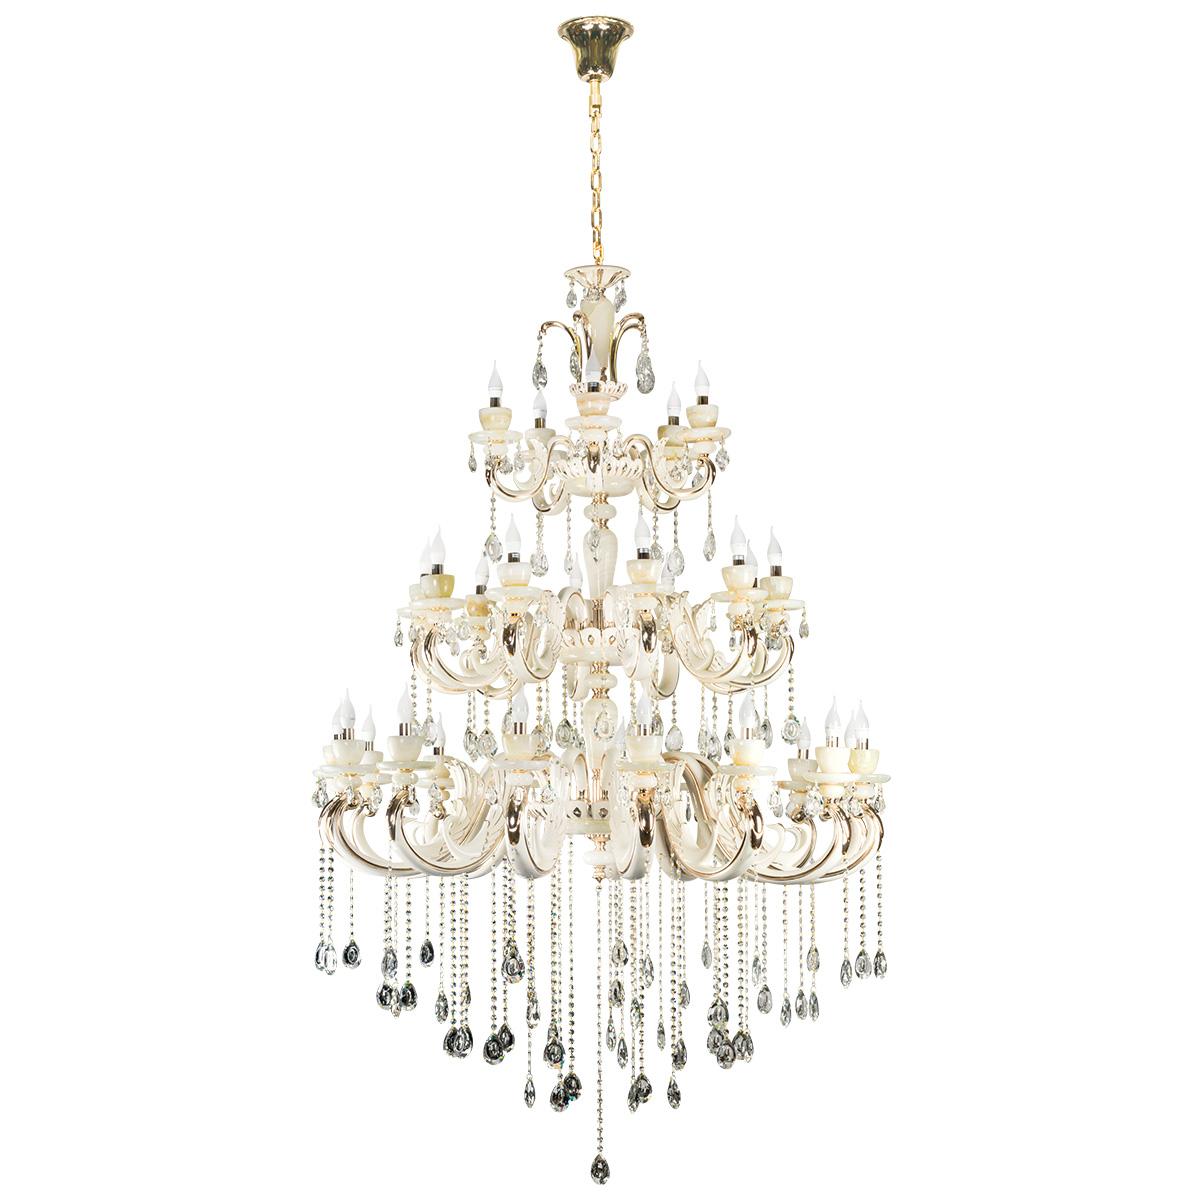 Marble Luxury Grand Chandelier 30xE14